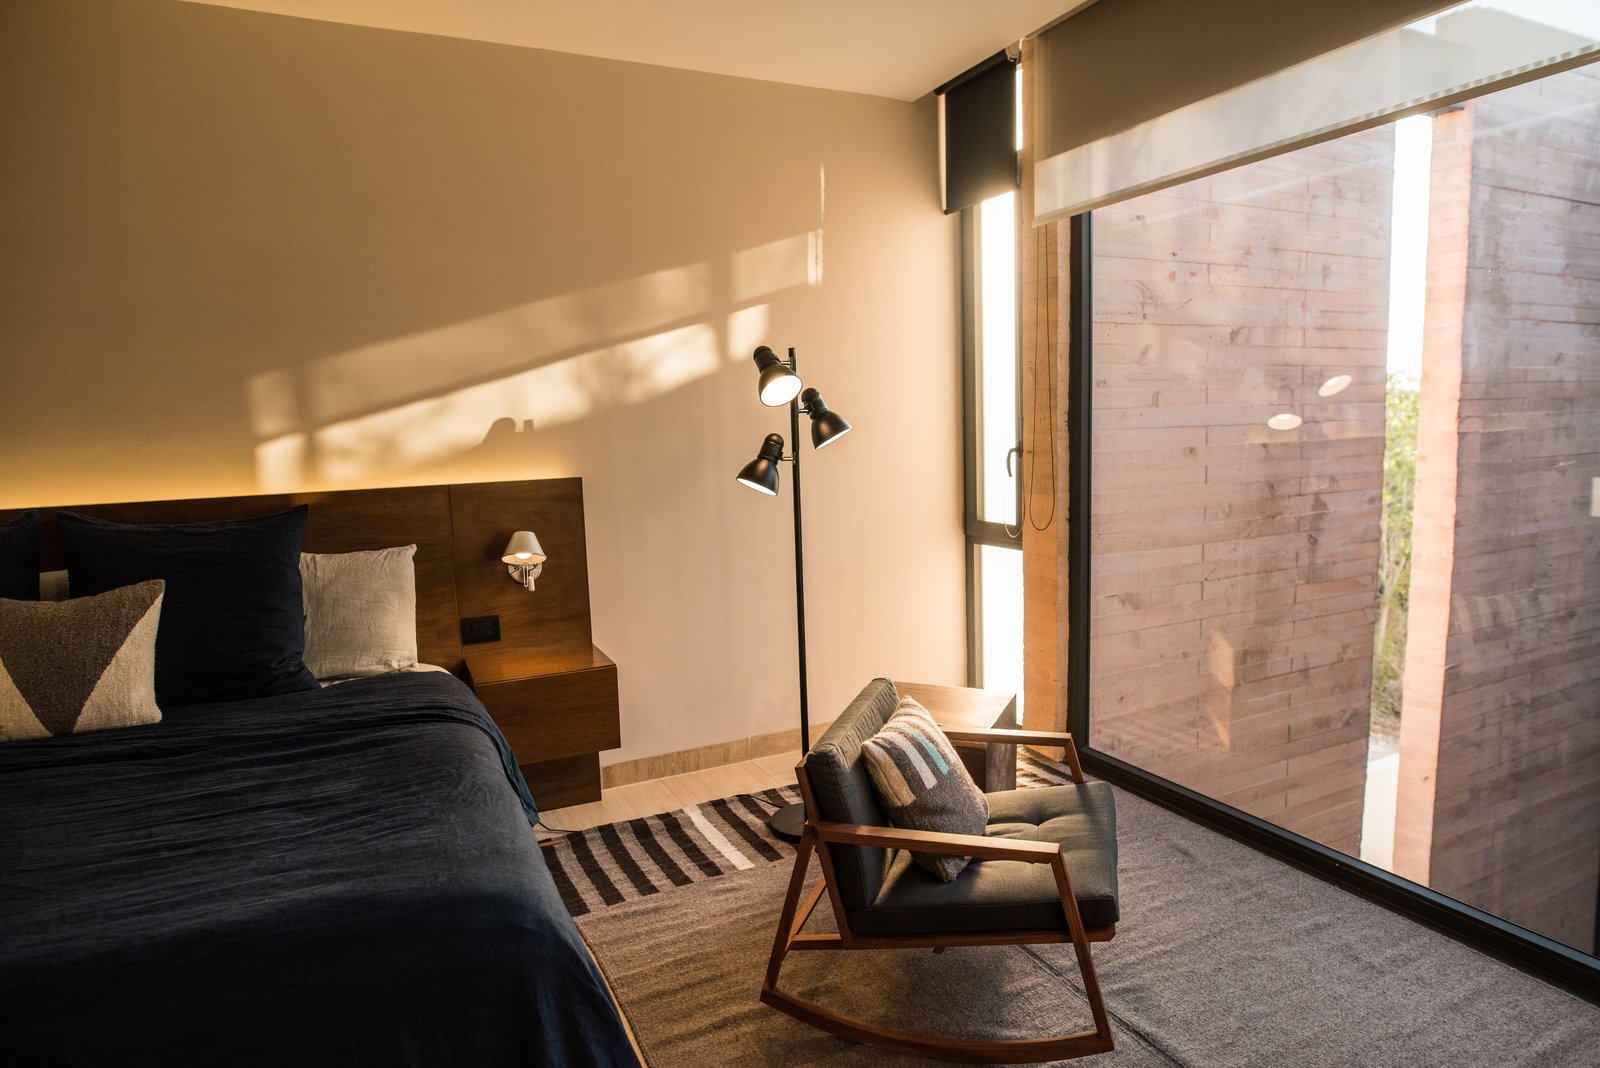 Bedroom Tagged: Bedroom, Chair, Travertine Floor, Accent Lighting, Marble Floor, and Floor Lighting. Casa Chaaltun by tescala